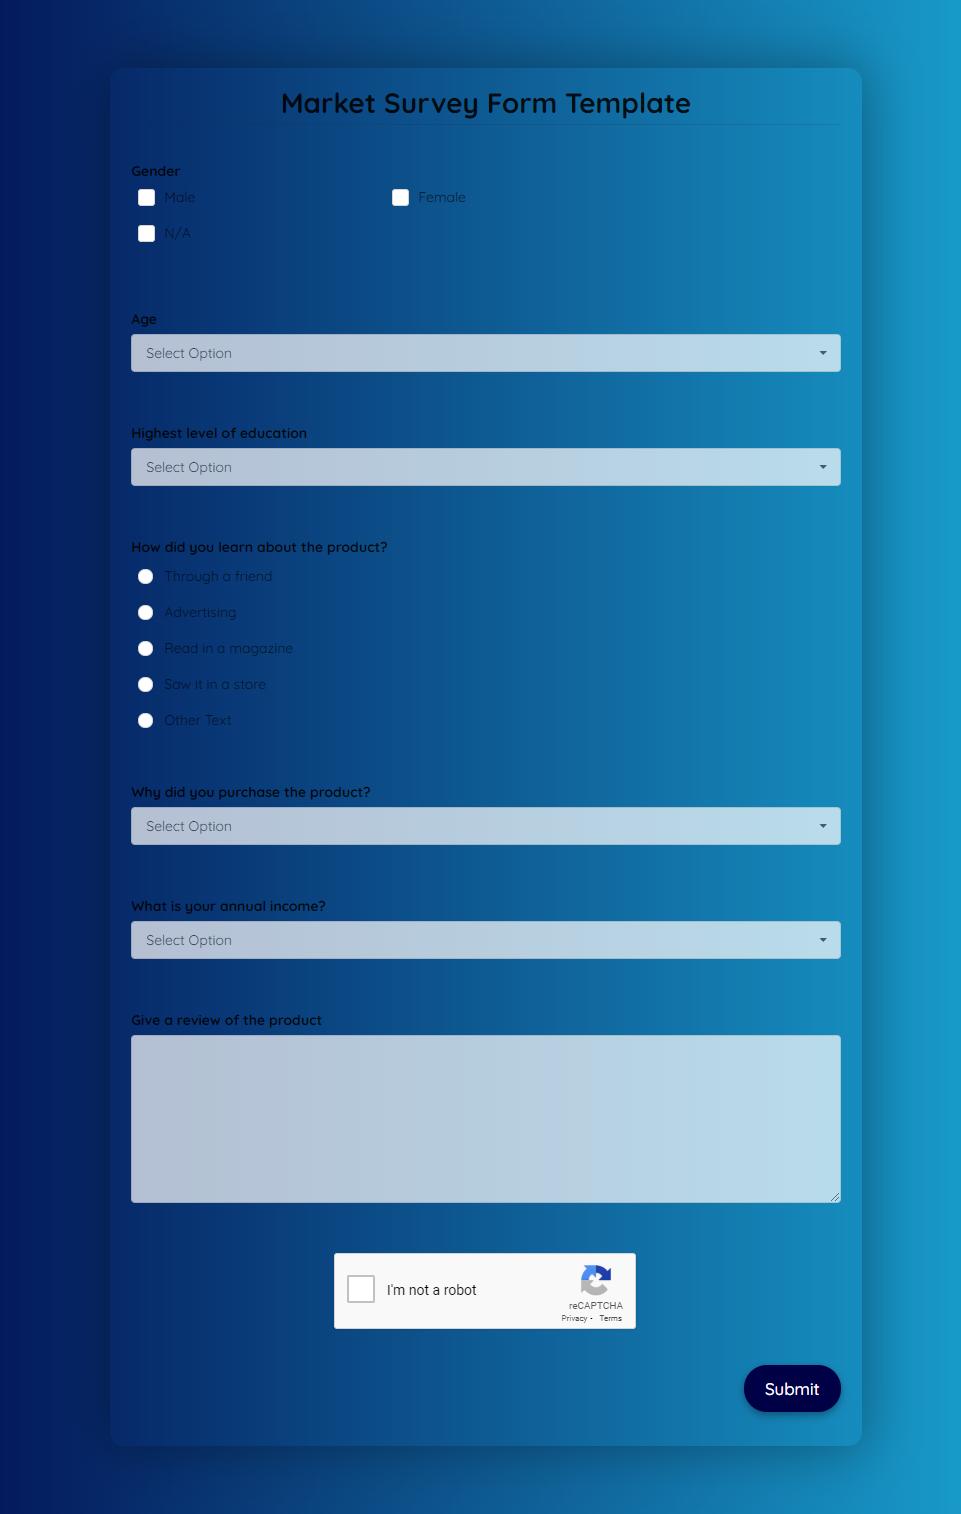 Market Survey Form Template template